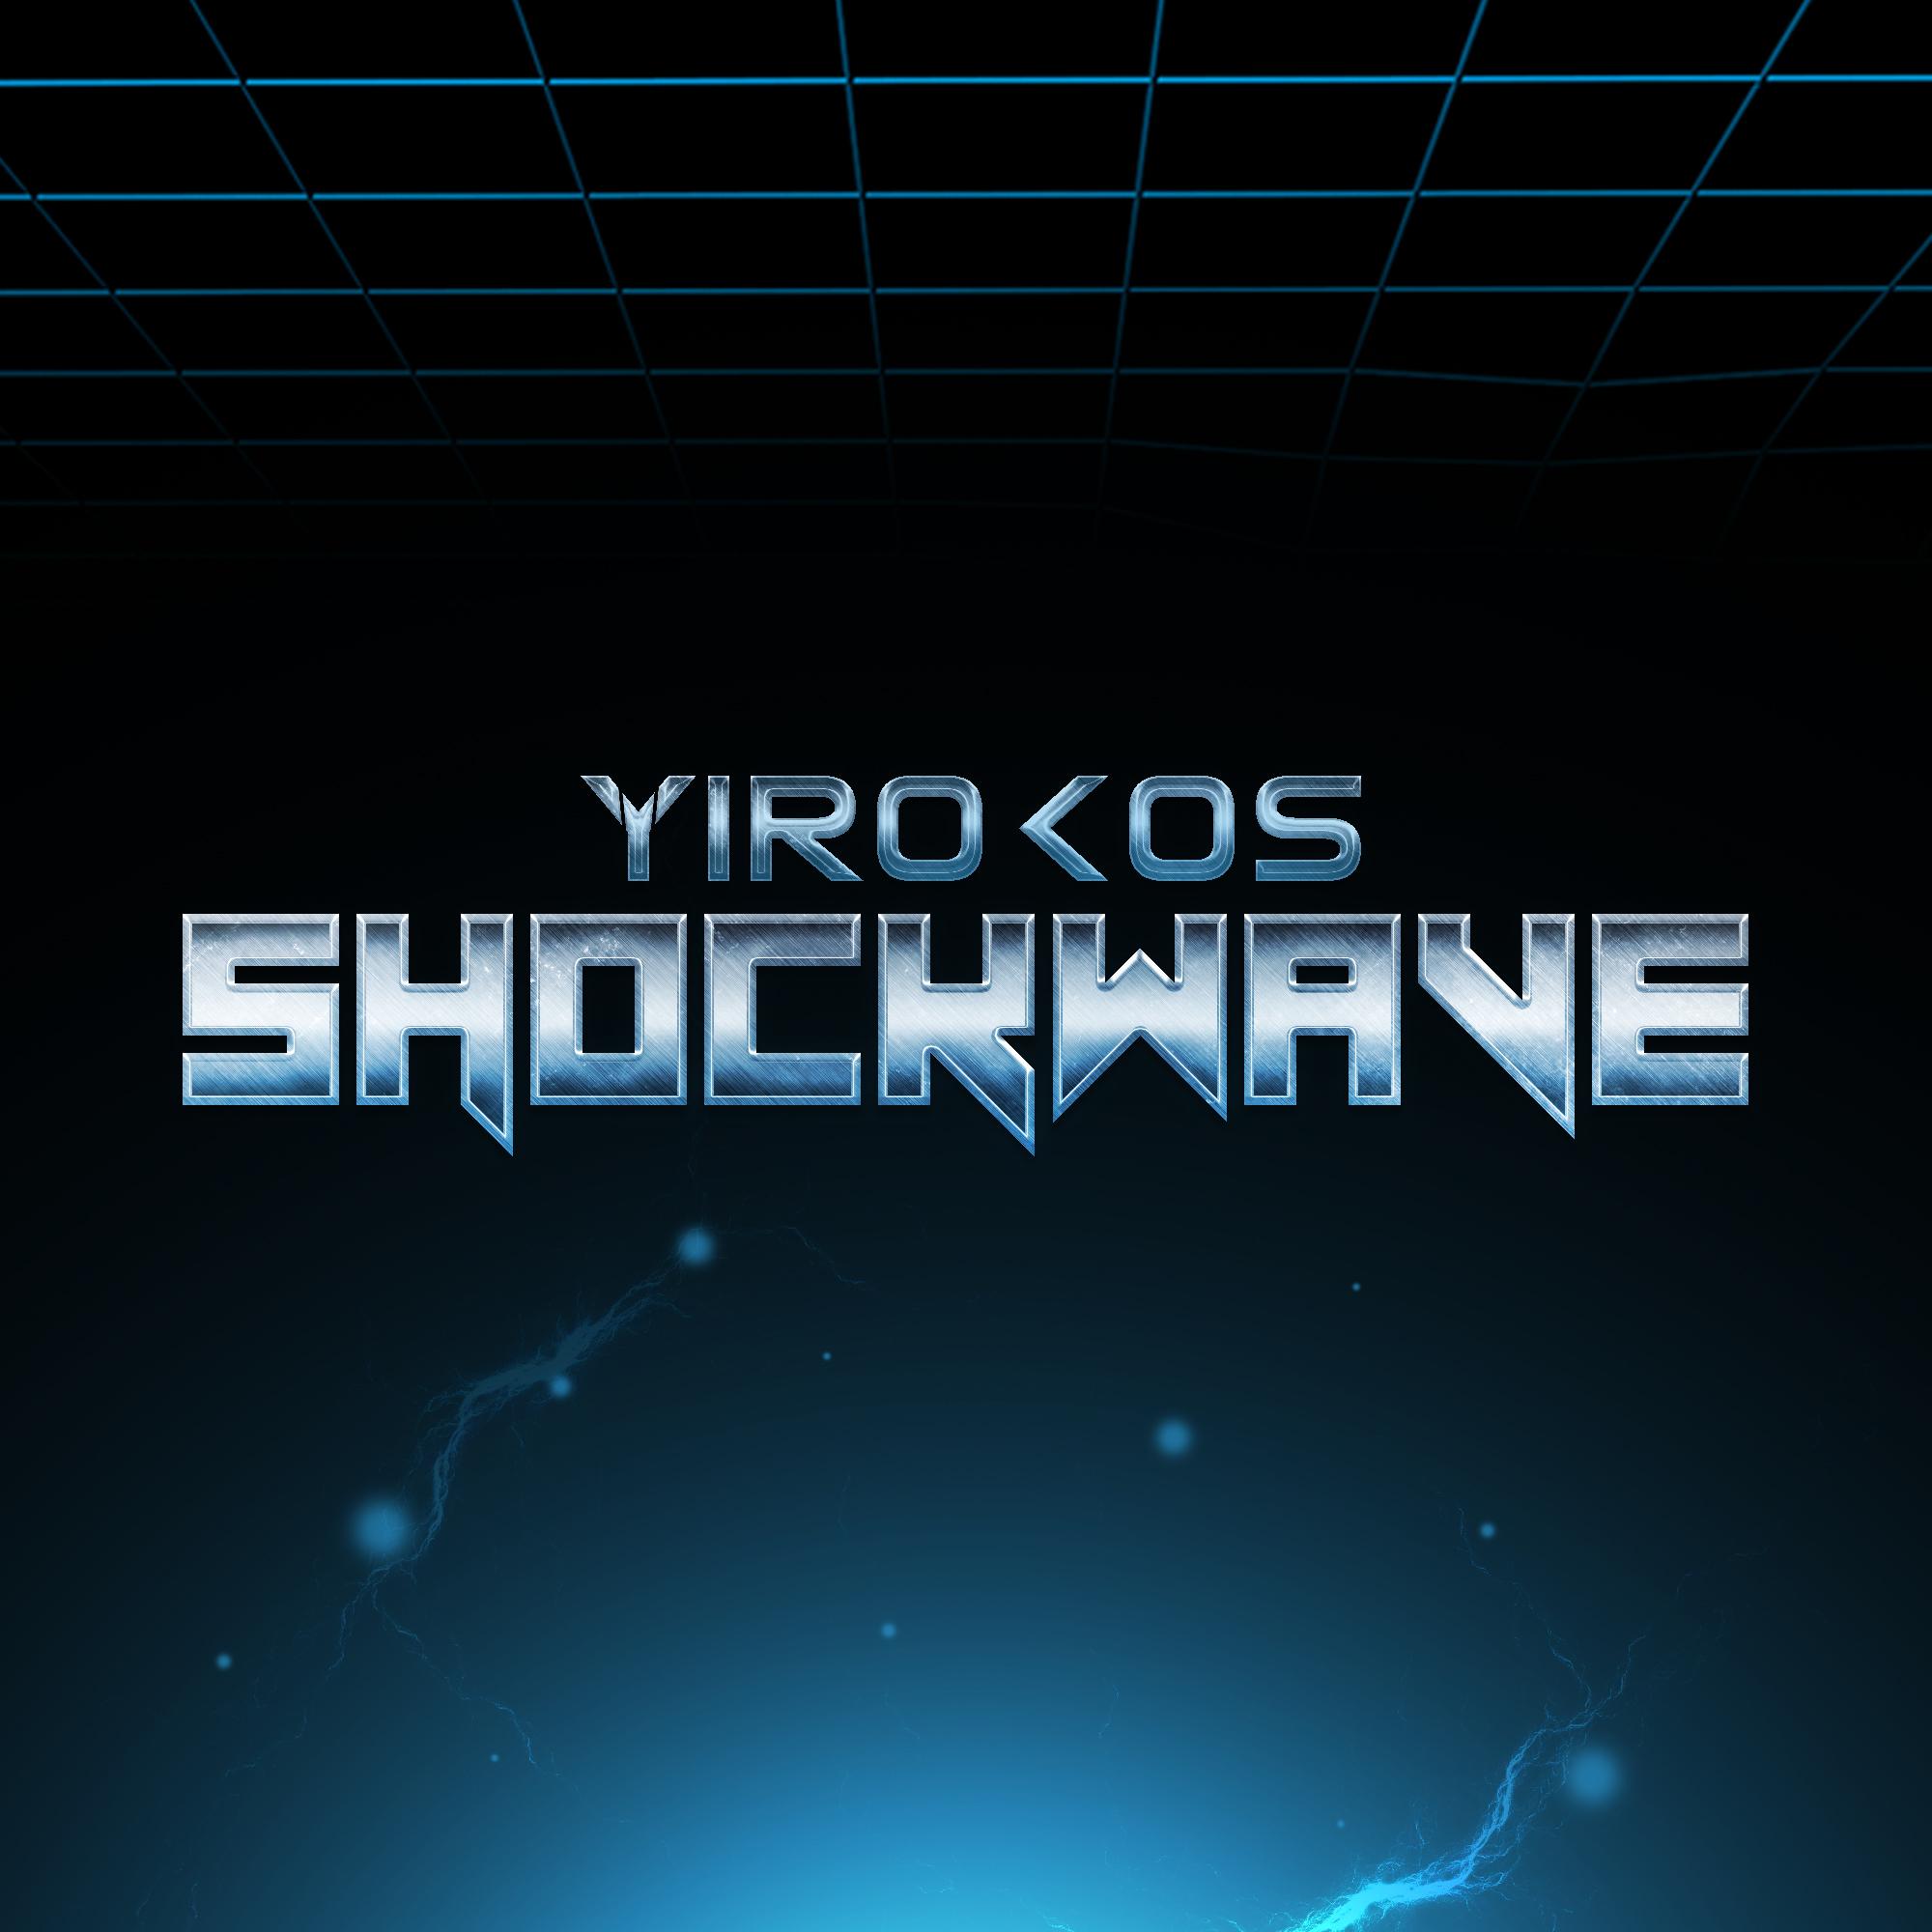 Yirokos - Shockwave cover art